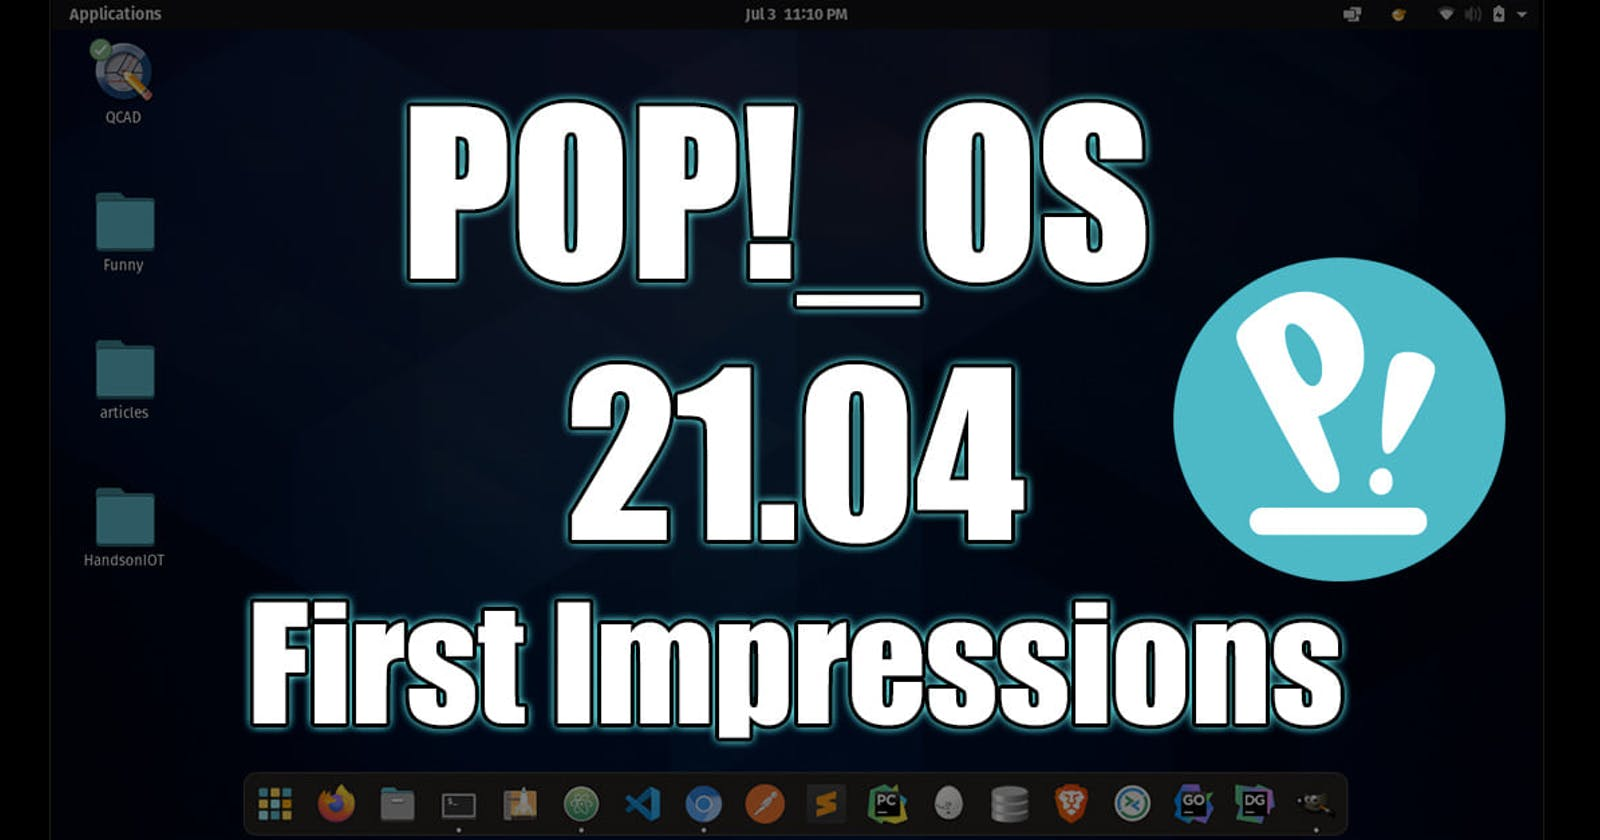 Pop!_OS 21.04 First Impressions